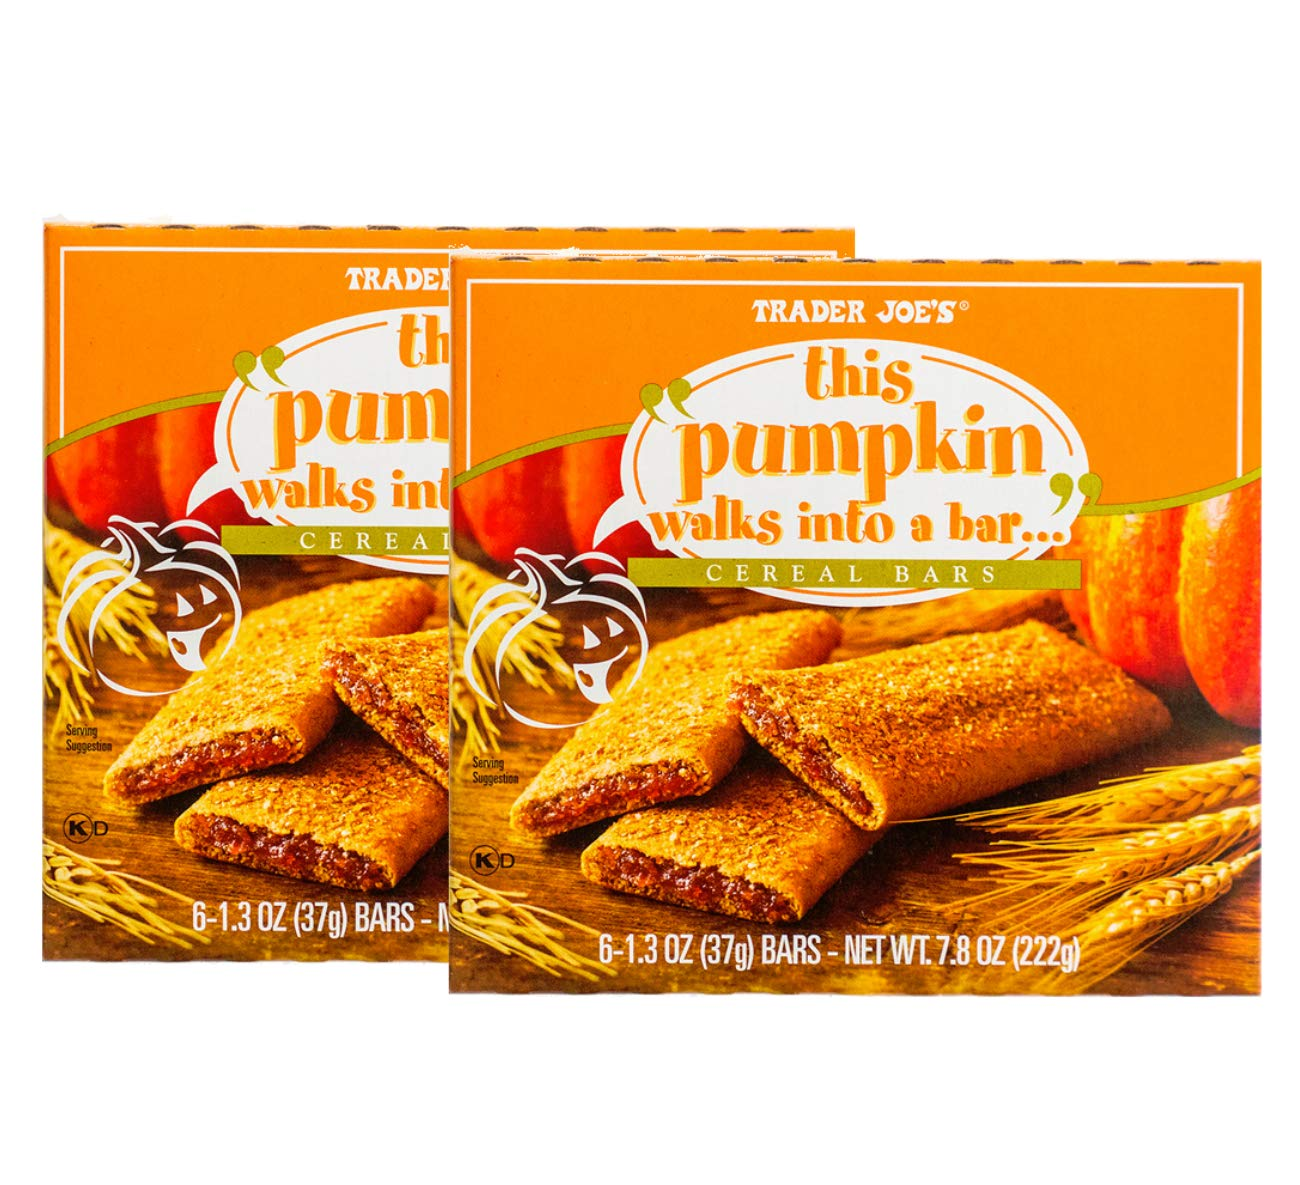 Trader Joe's''This Pumpkin Walks Into a Bar'' Individually-Wrapped Natural Cereal Bars - 12 Ct. (1.3 oz) by FCV